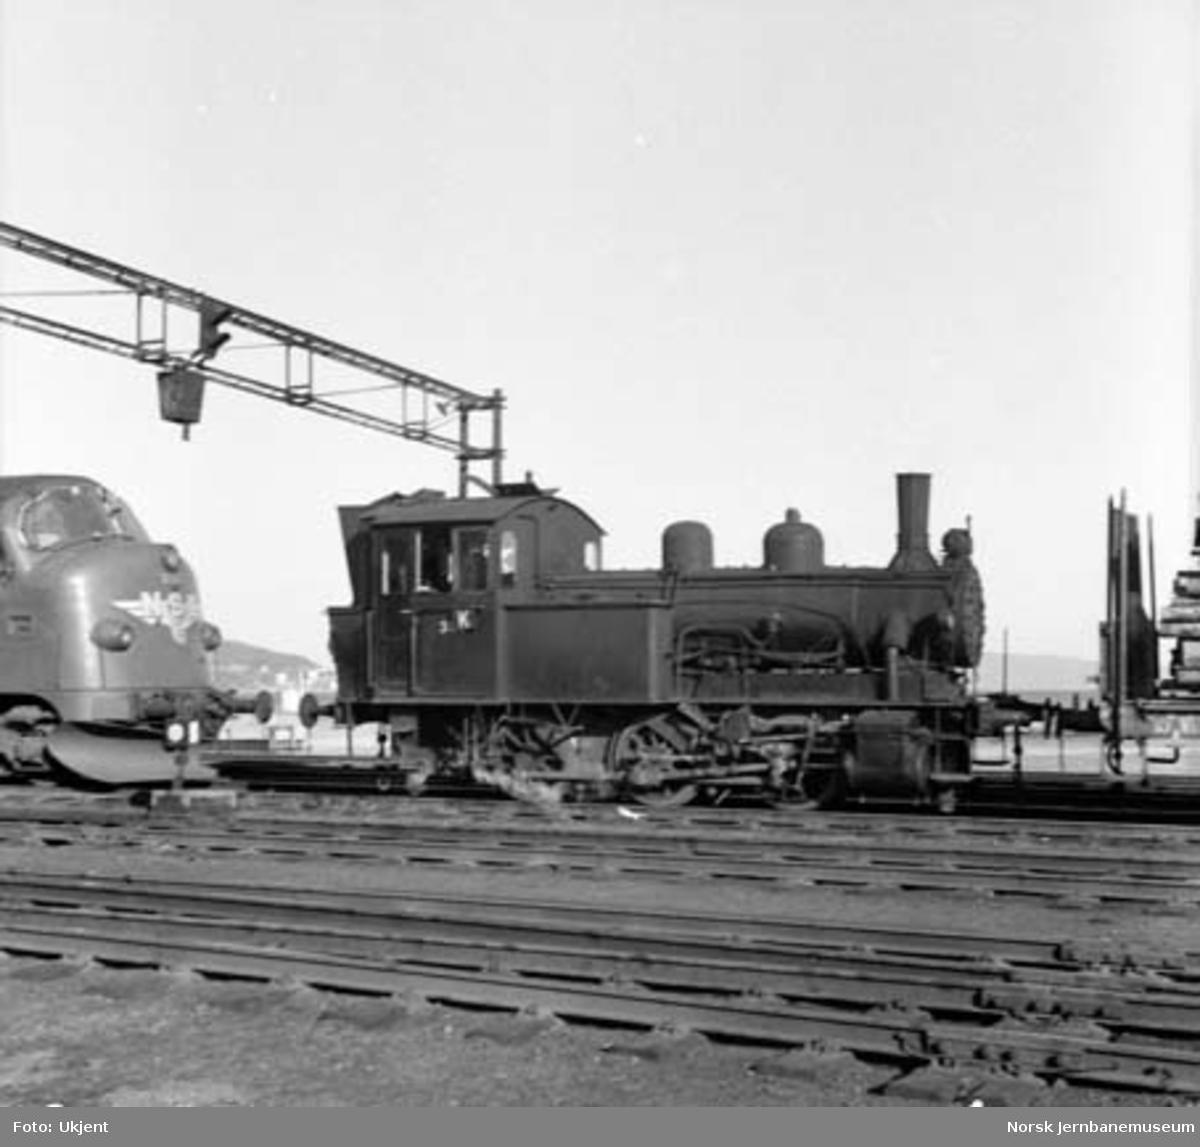 Damplokomotiv type 25c nr. 383 på Trondheim stasjon